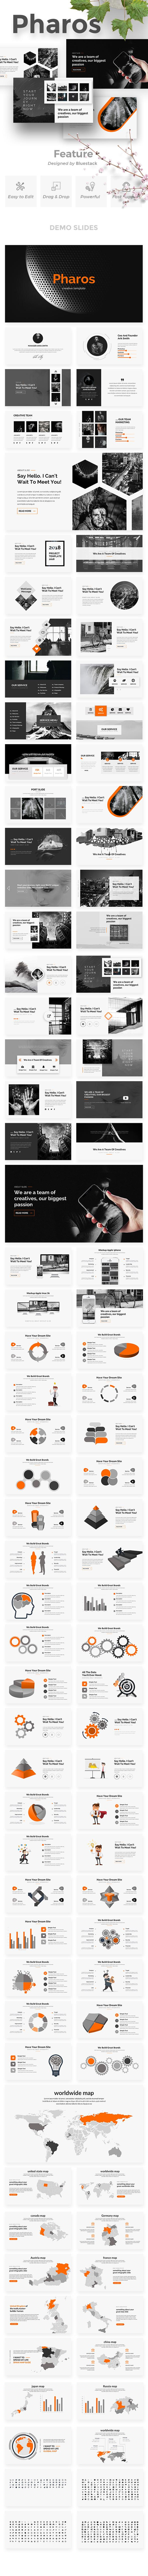 Pharos Creative Google Slide Template by bluestack | GraphicRiver